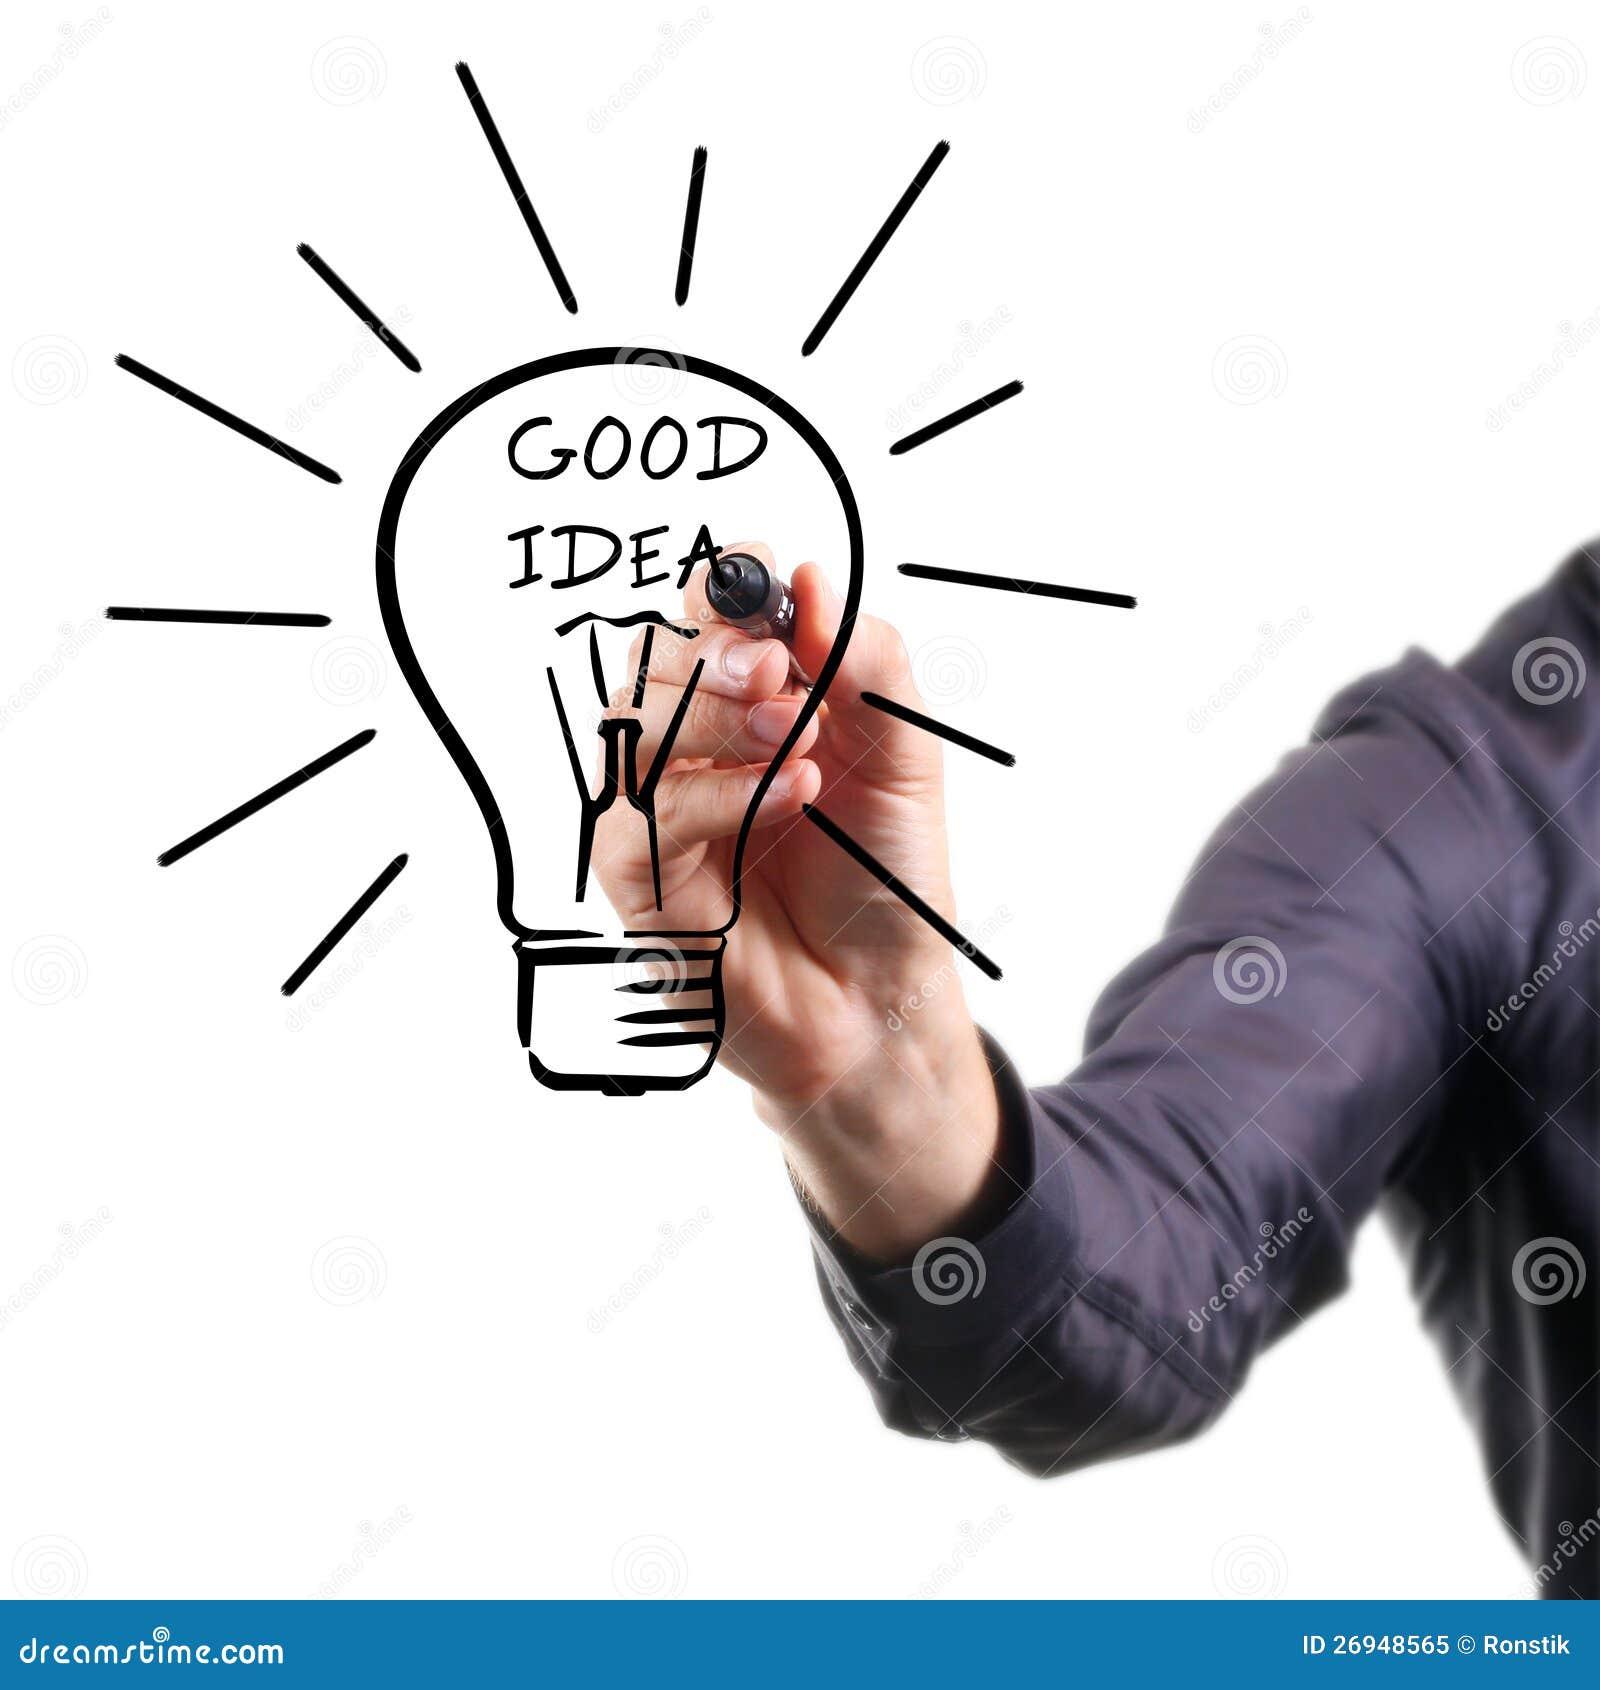 Good idea plus hard work equals success stock image for Good url ideas